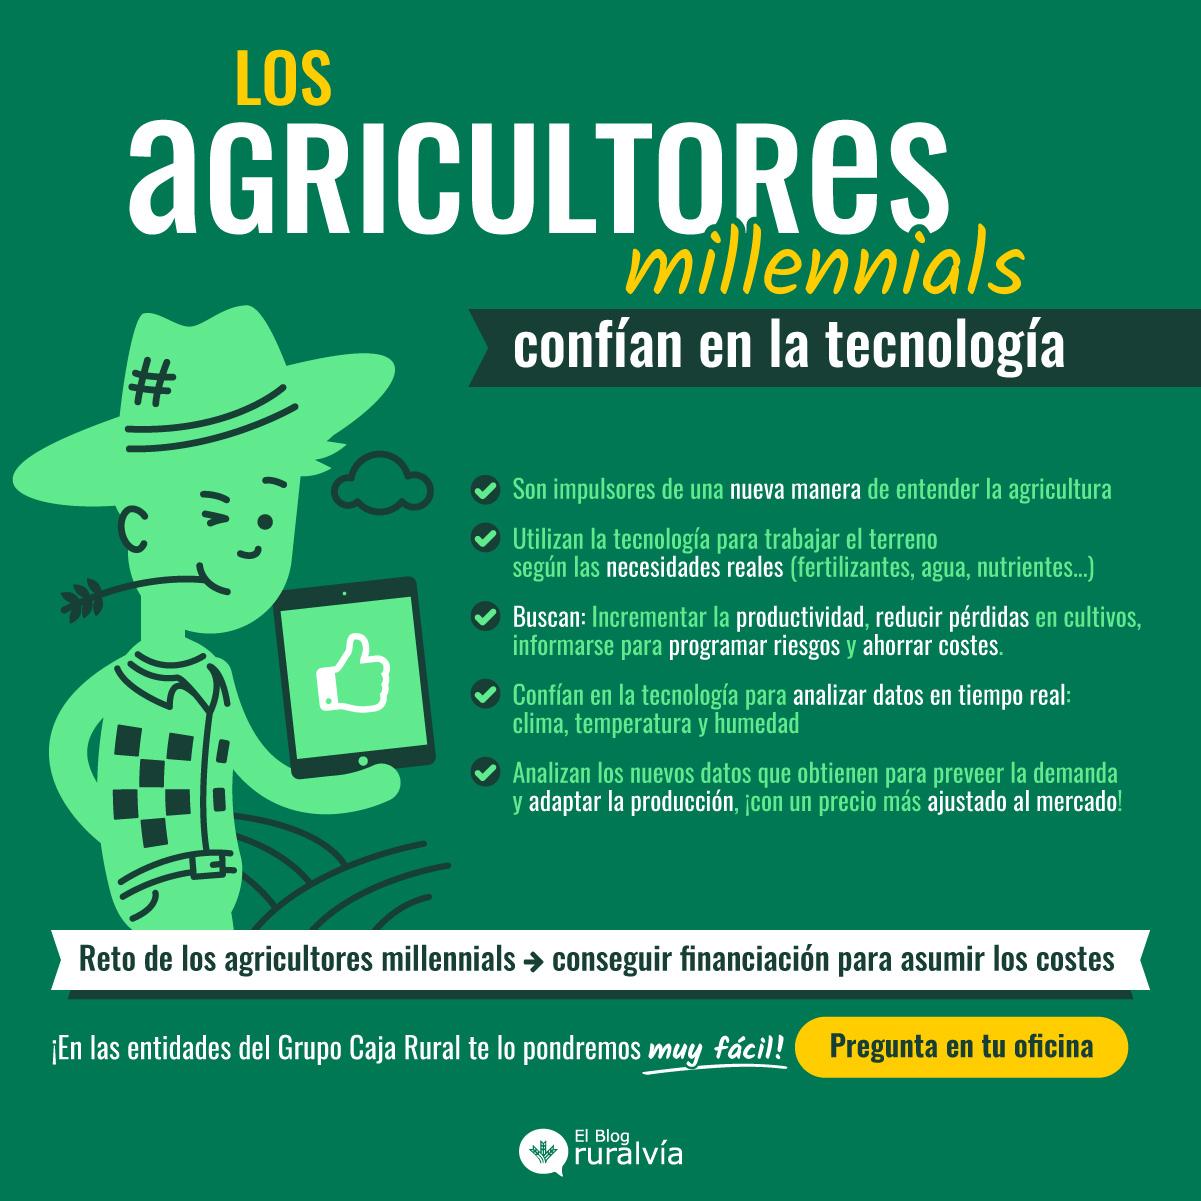 agricultura tecnología millennials